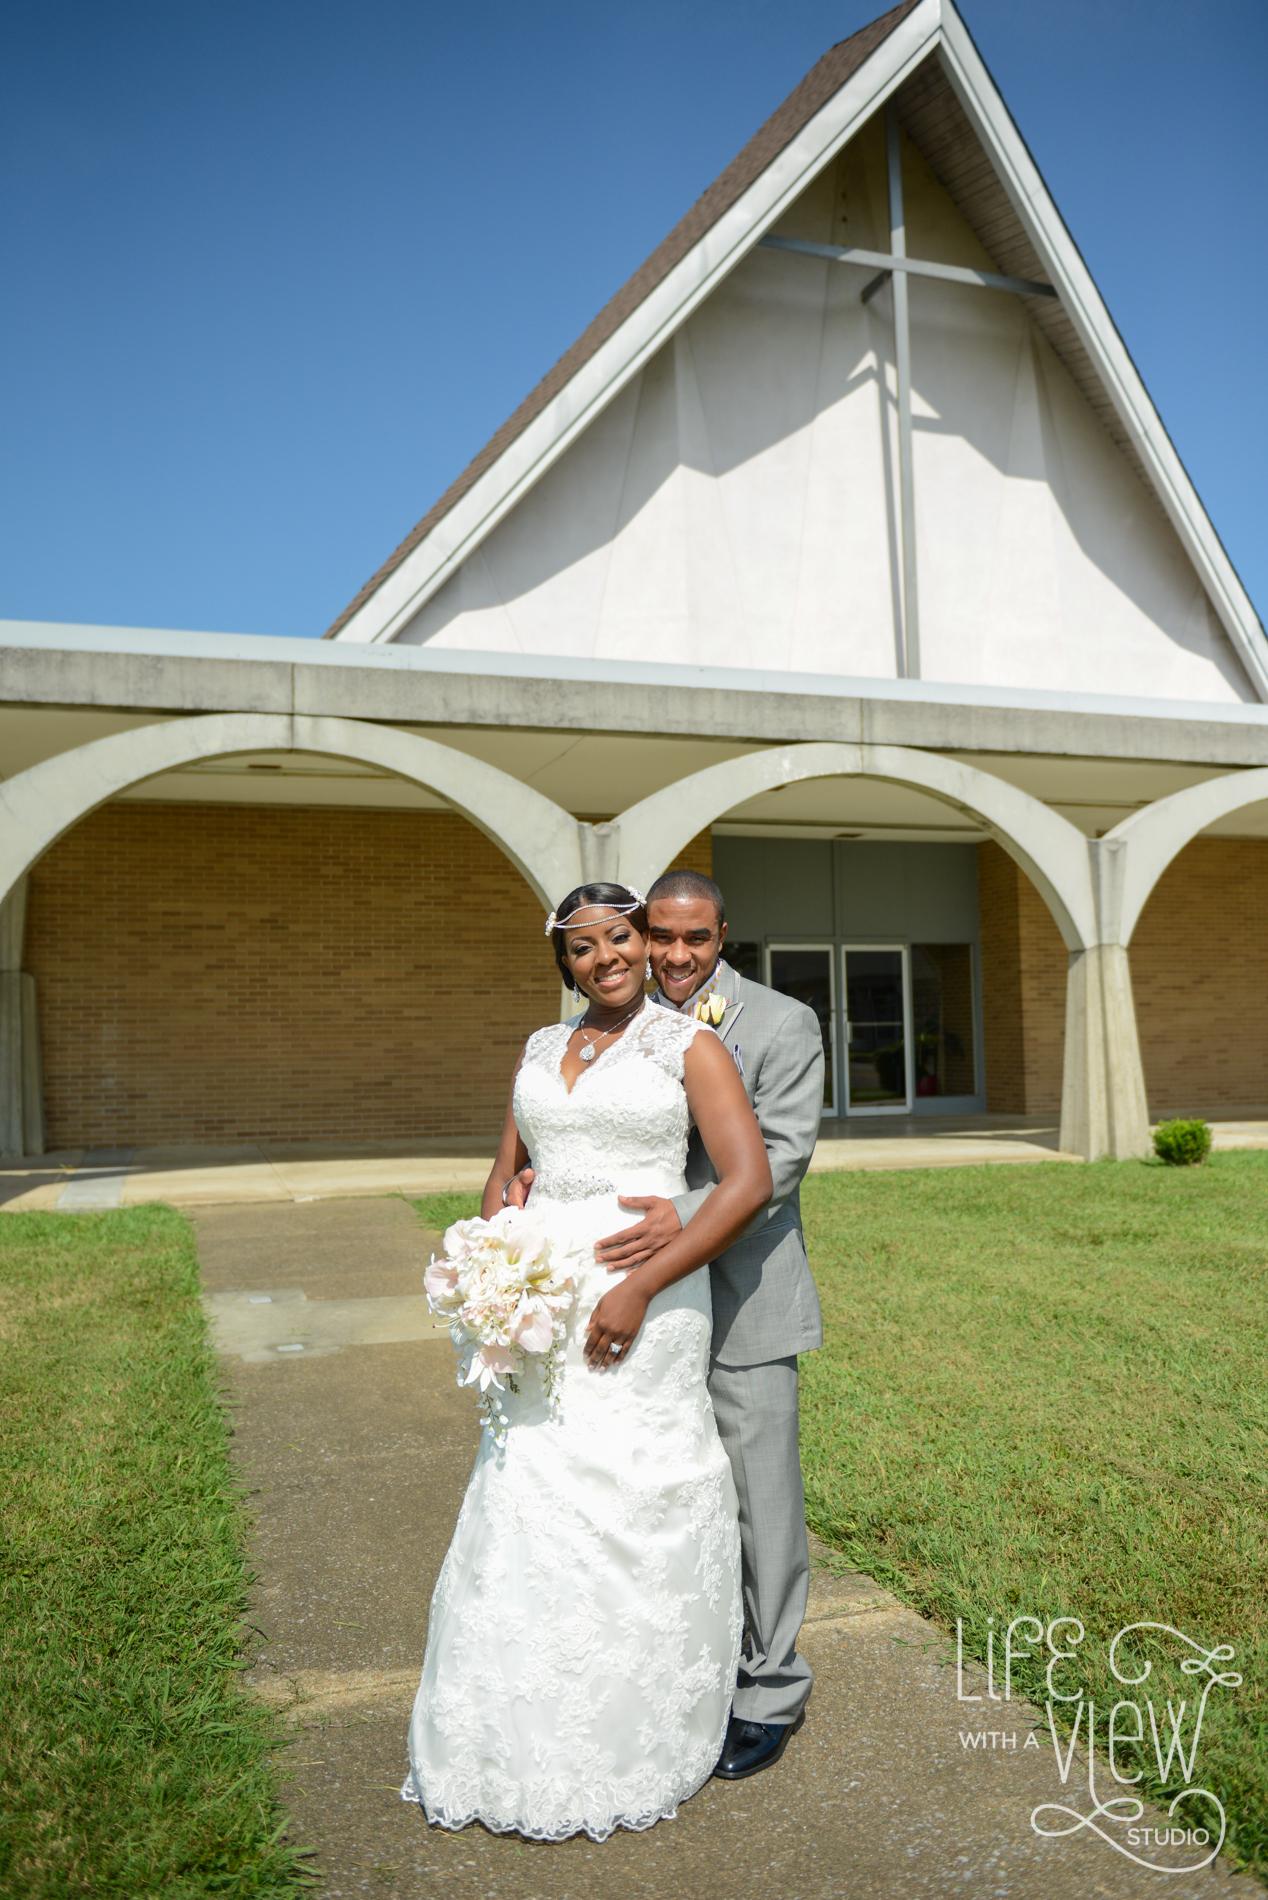 Stratton-Hall-Wedding-14.jpg